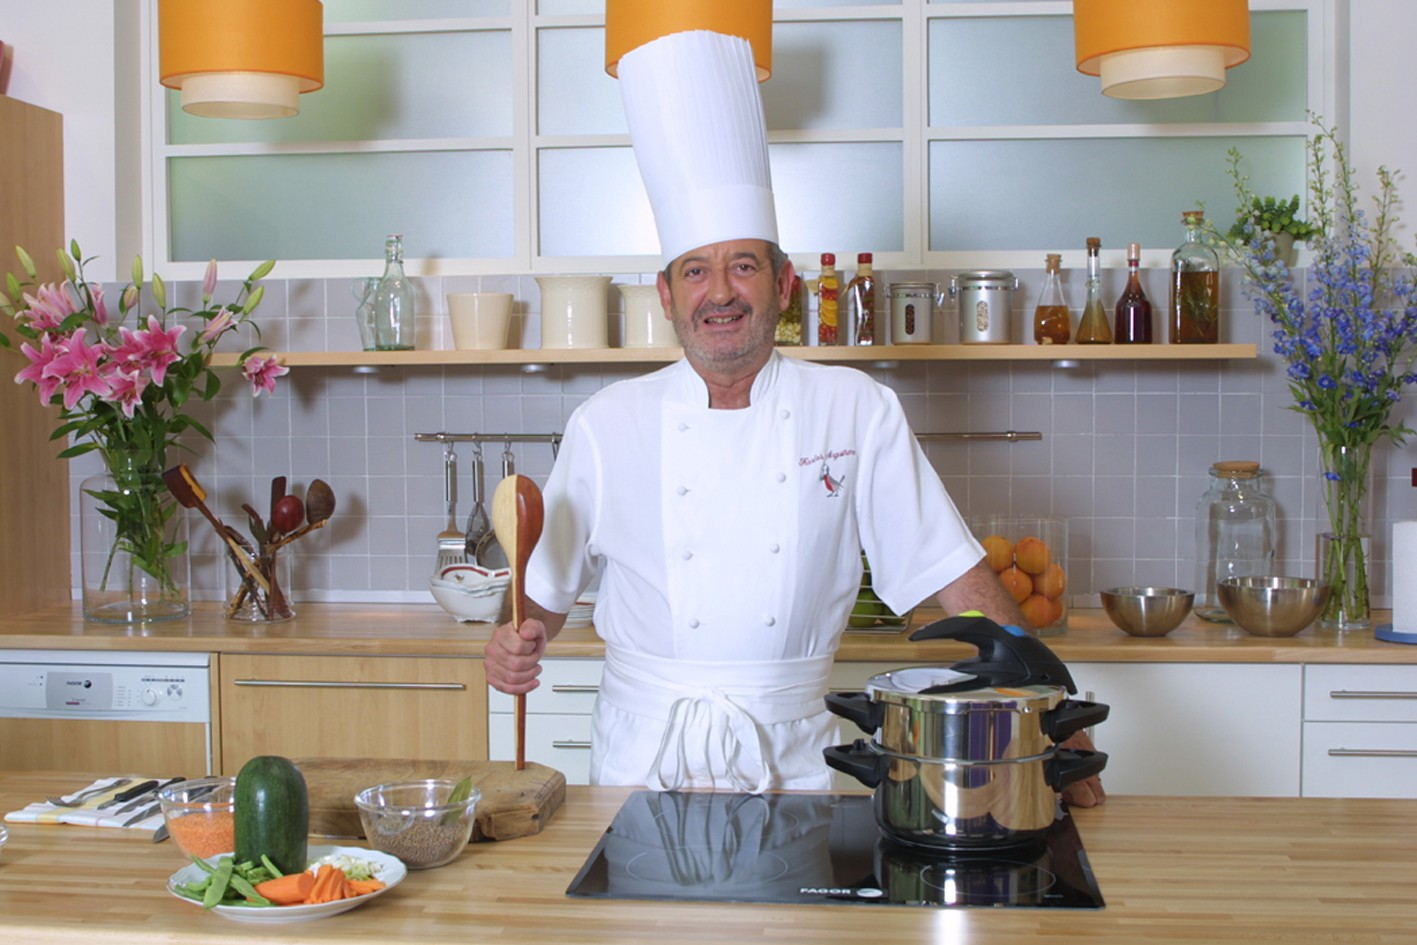 karlos argui ano profesor de cocina